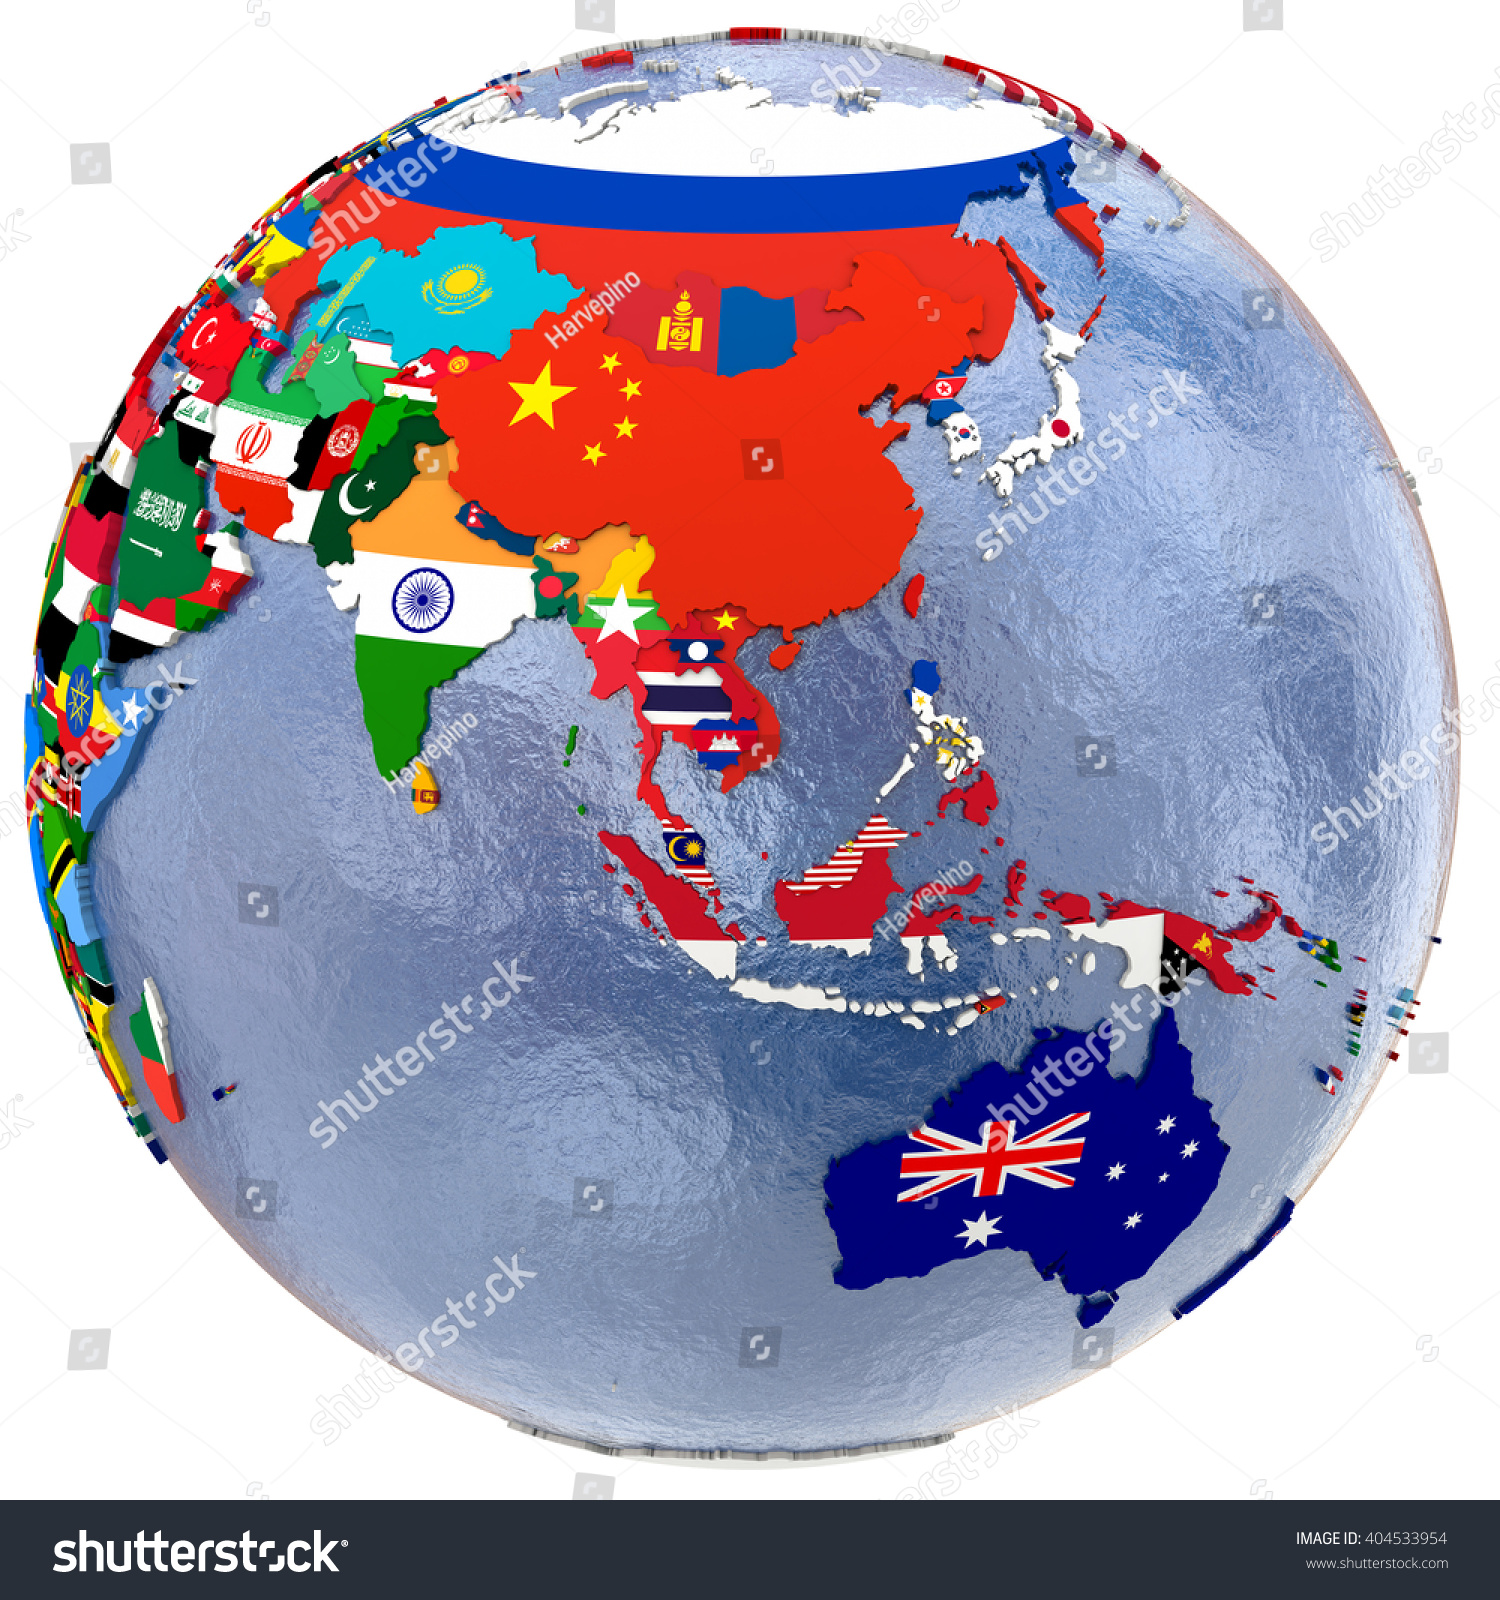 Political Map Of Southeast Asia And Australia With Each Country – South and East Asia Political Map